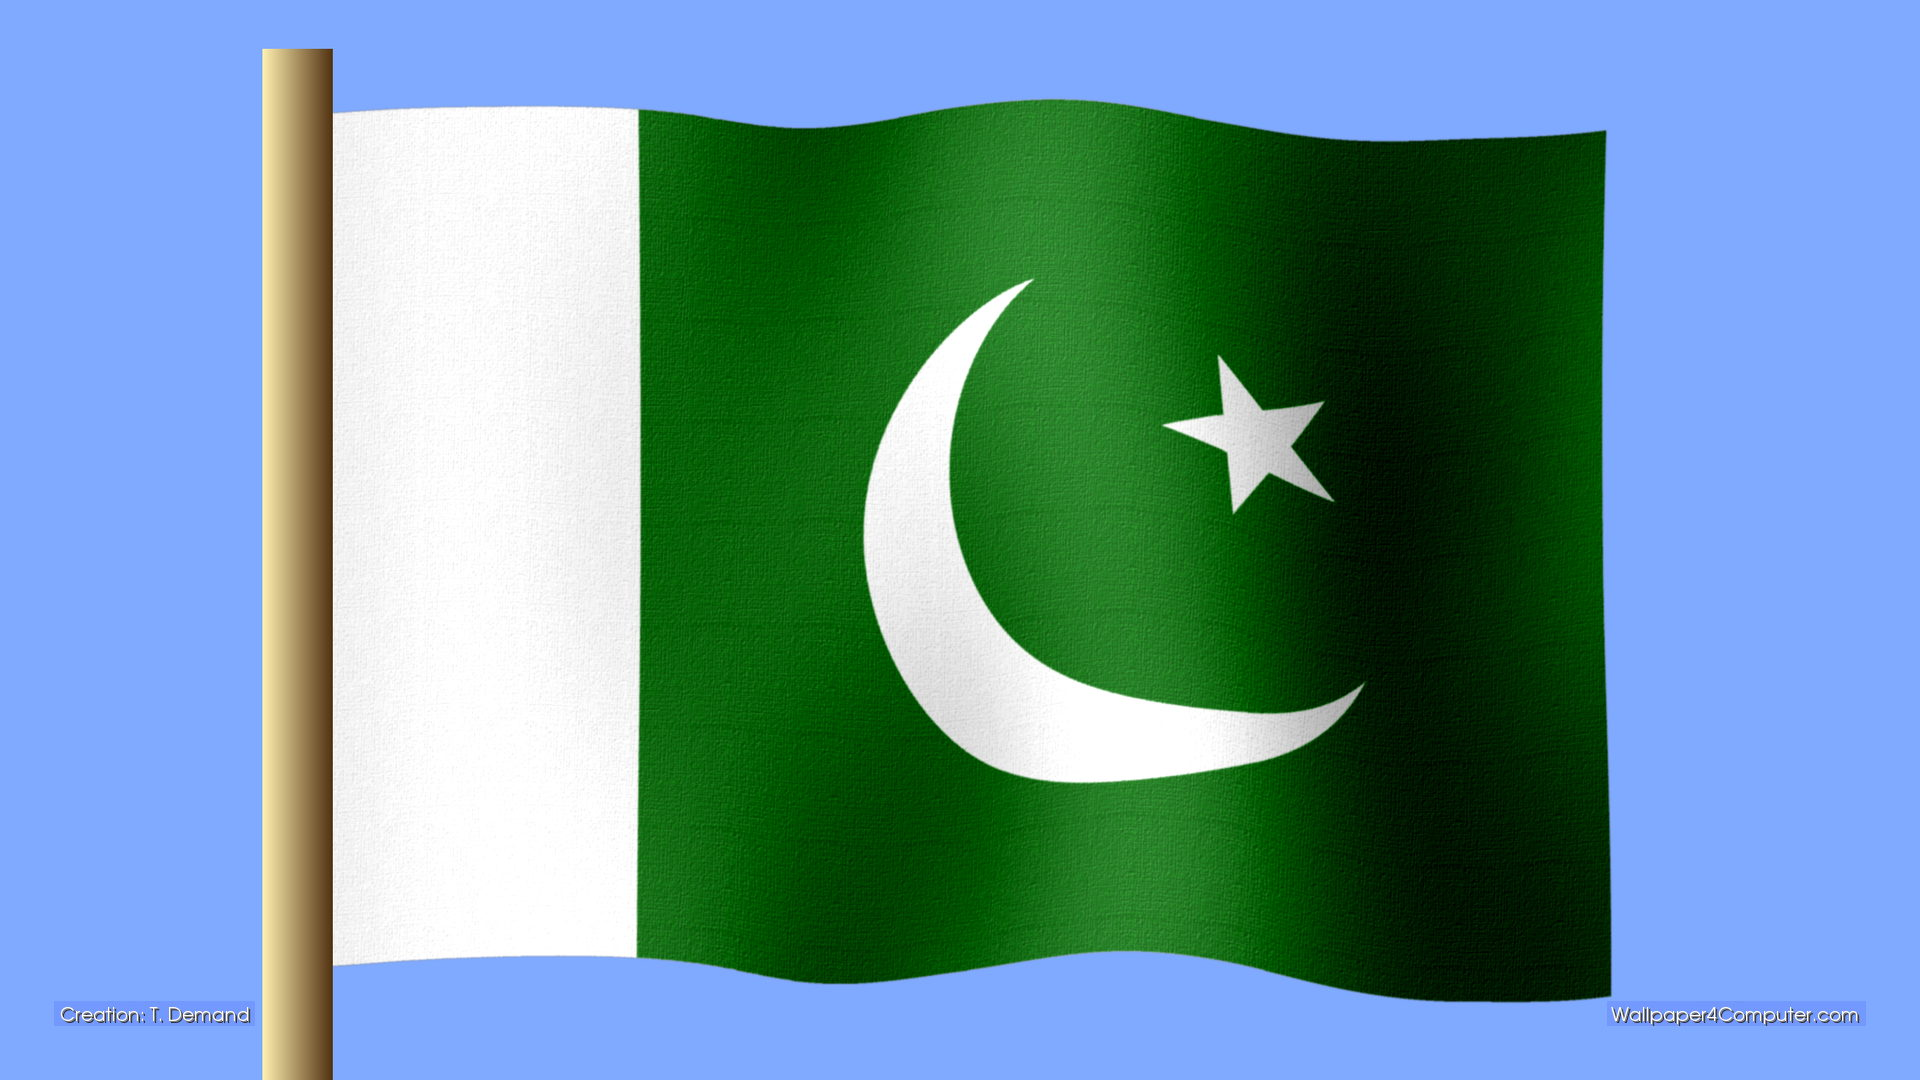 Pakistani flag hd wallpaper wallpapersafari for 3d wallpaper for home in pakistan